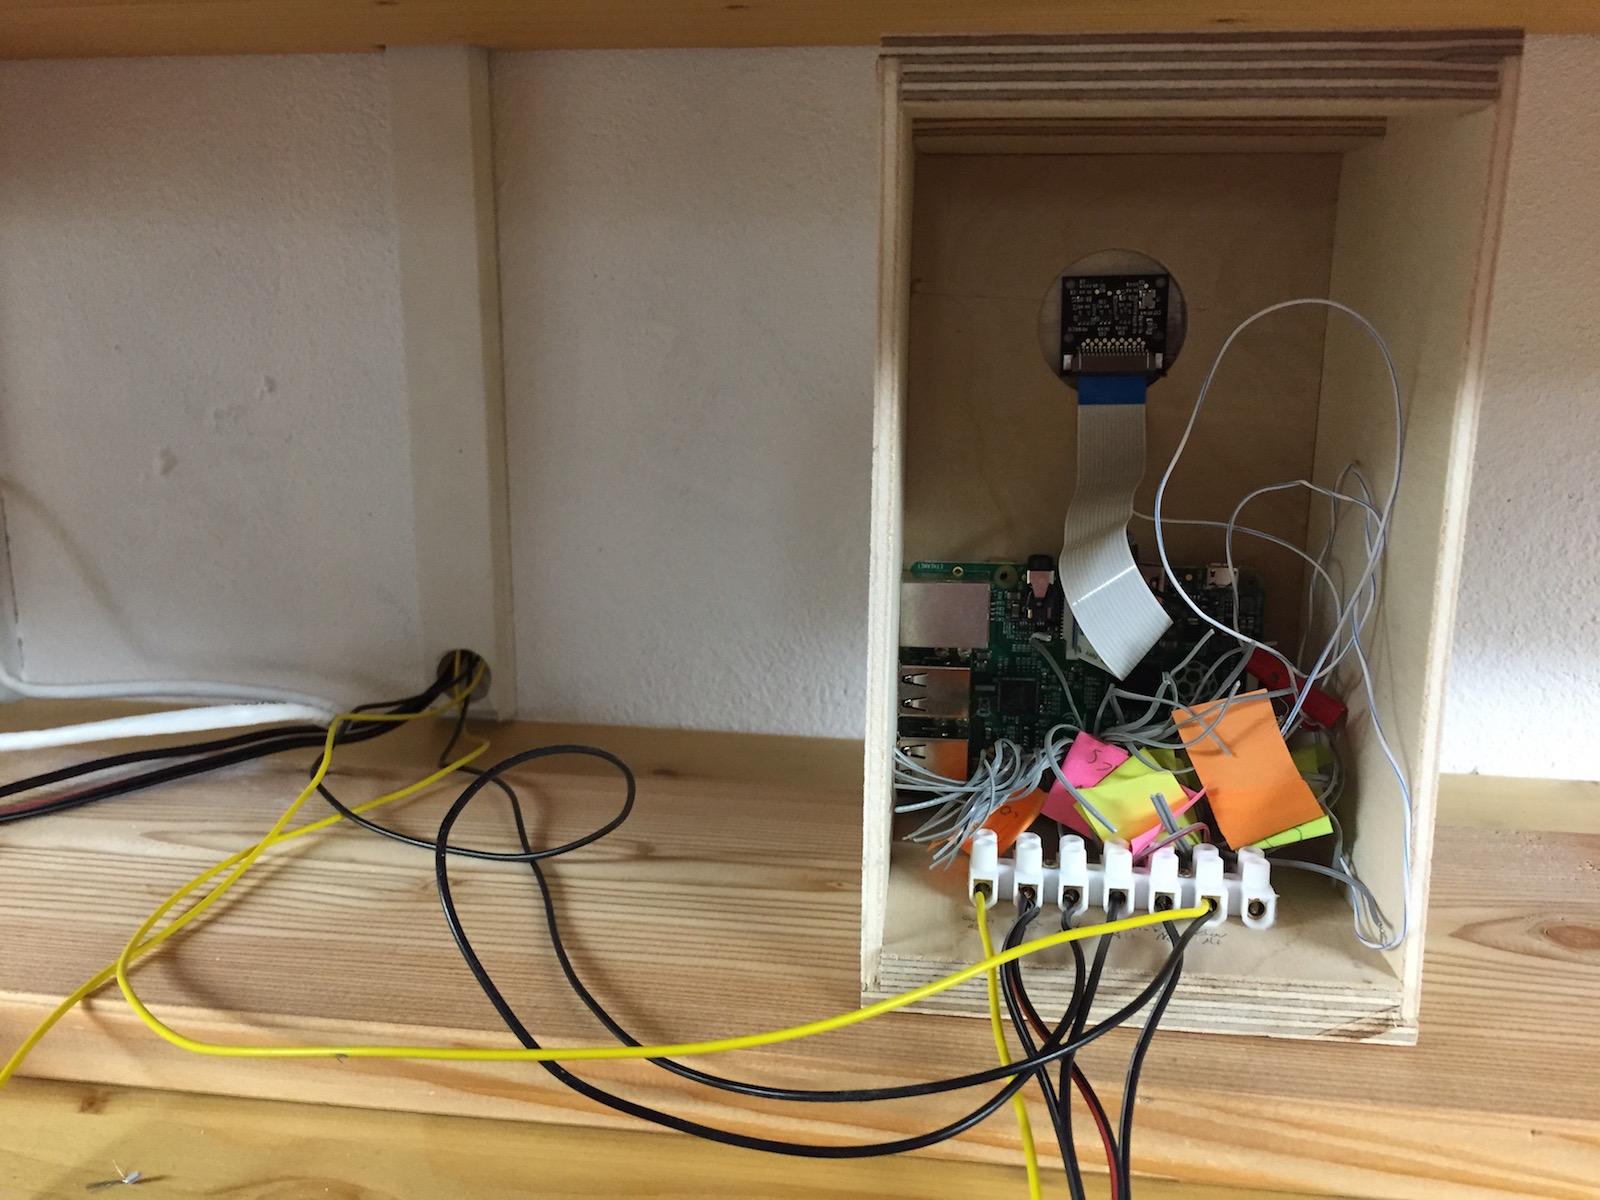 Raspberry Pi Garage Door Controller Glumb Opener Wiring Diagram Further Electrical Rpi